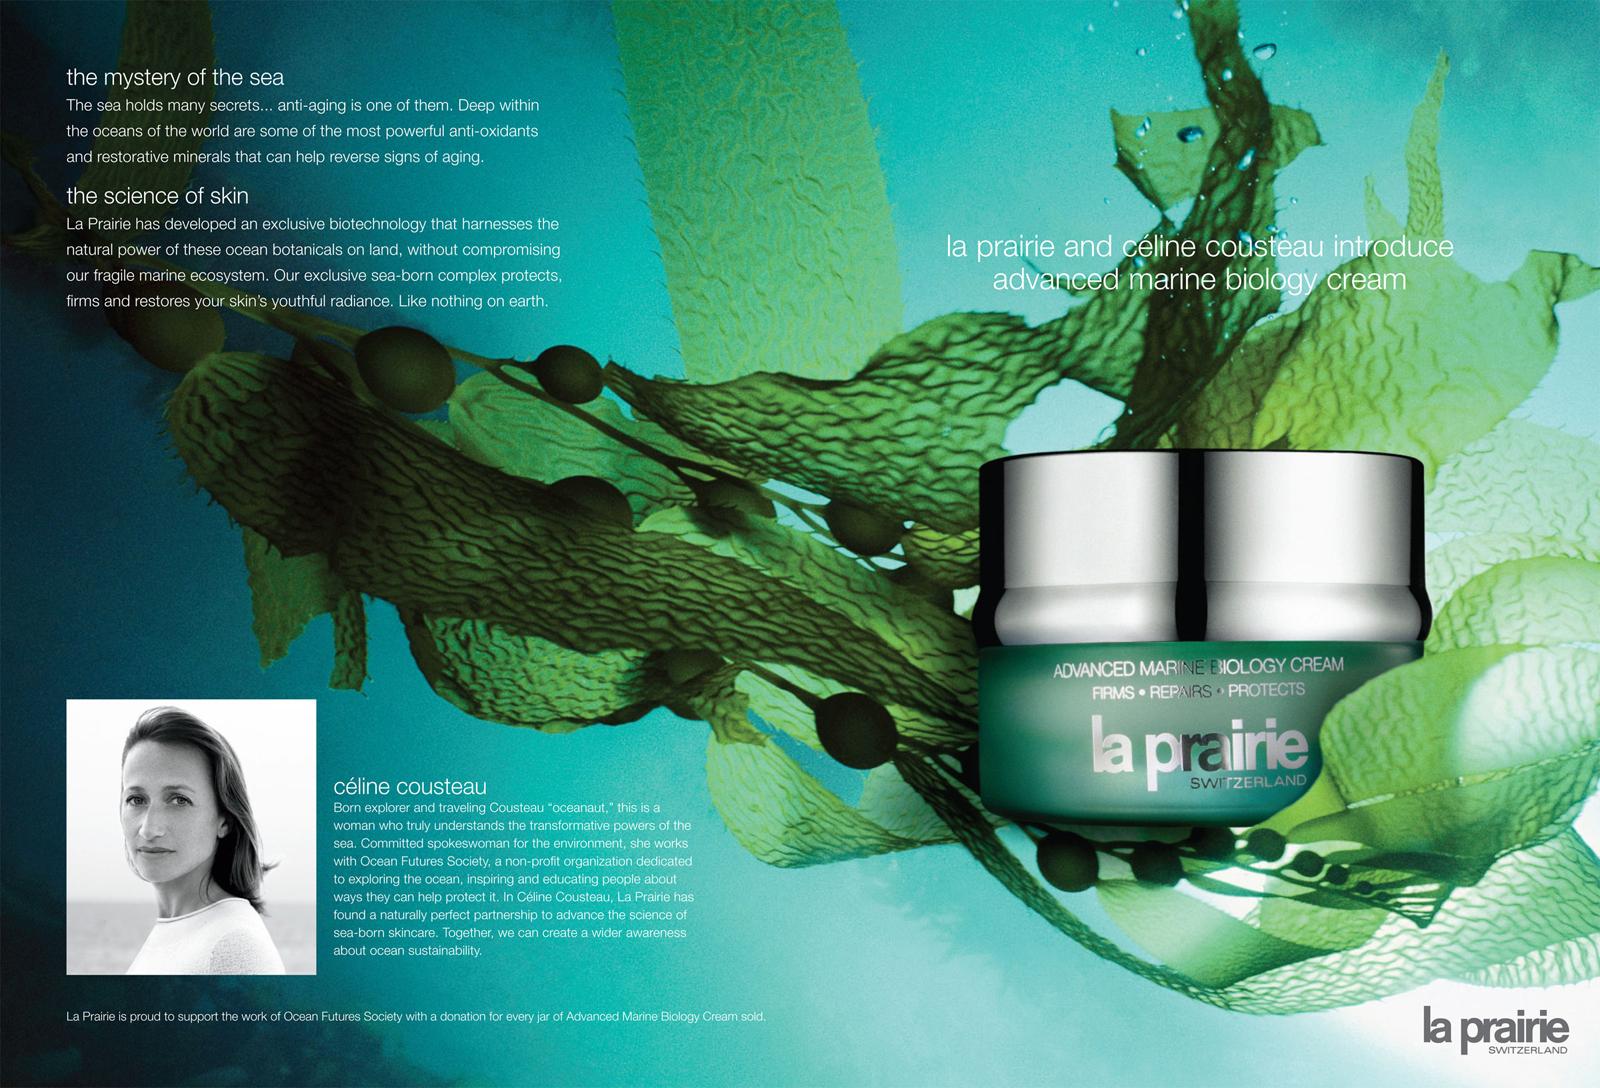 la prairie: advance marine biology cream: print